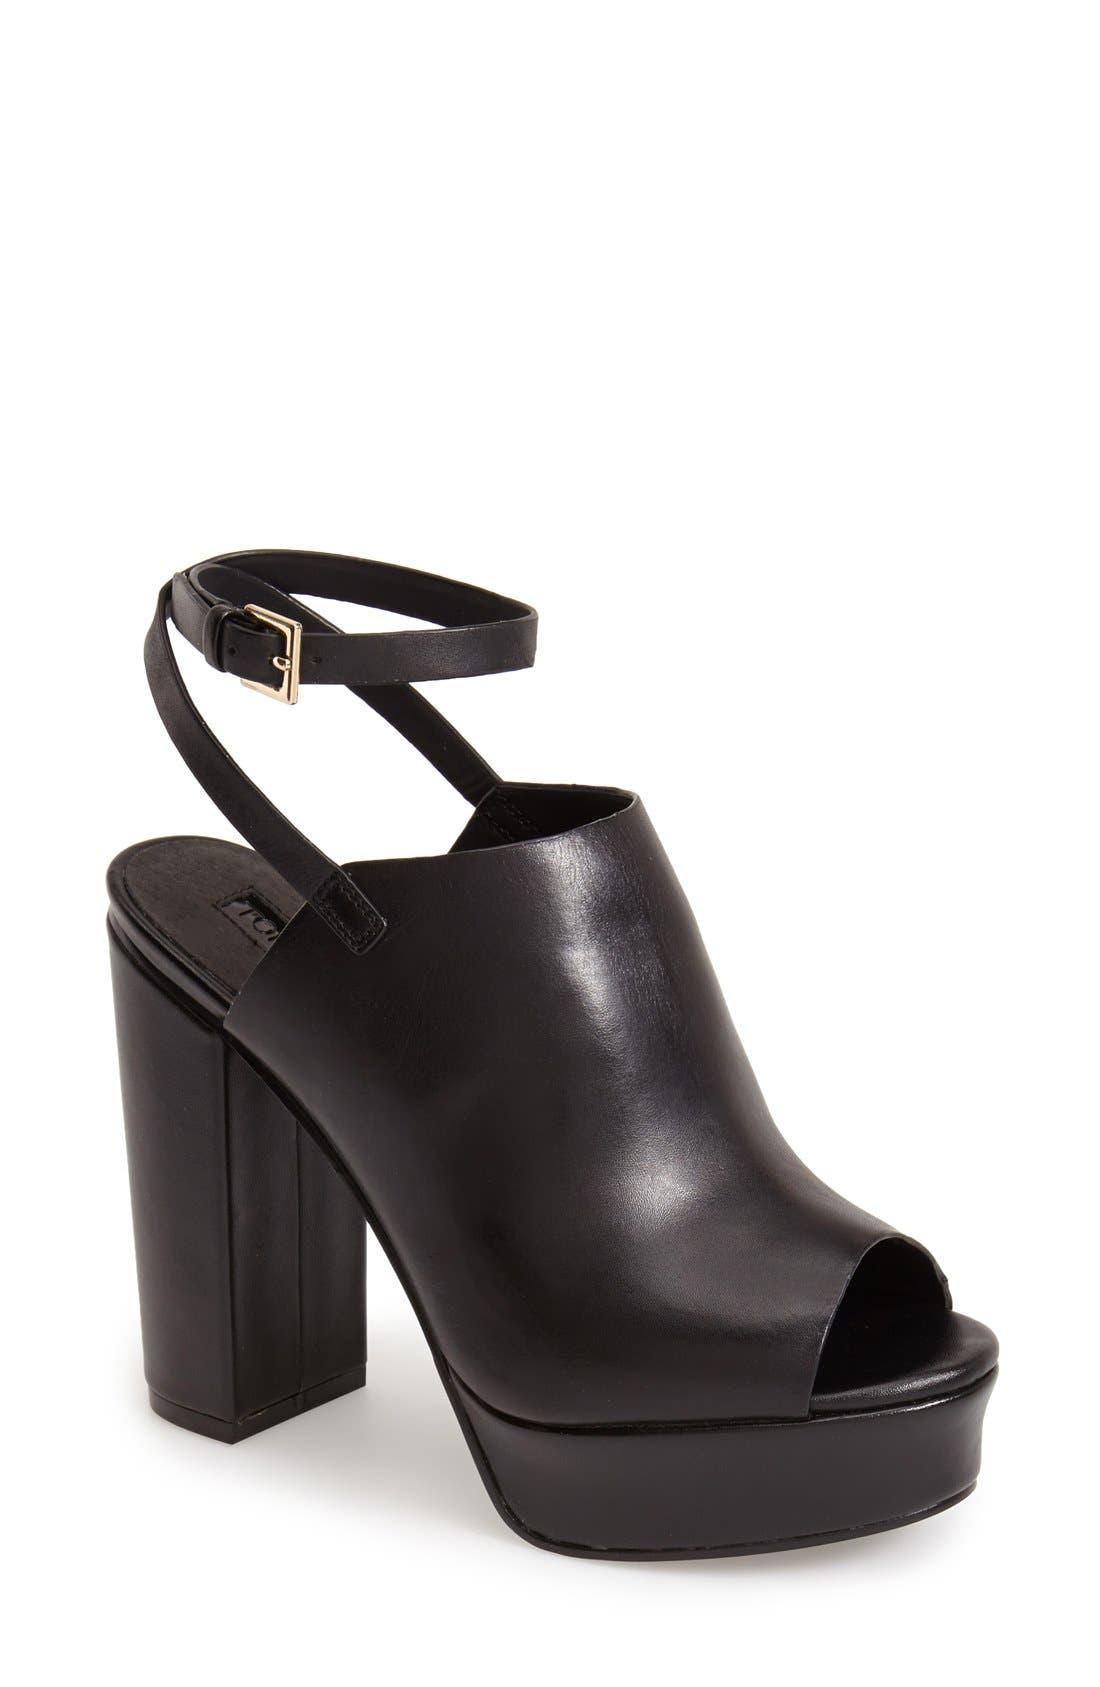 Alternate Image 1 Selected - Topshop 'Sagittarius' Leather Ankle Strap Open Toe Platform Sandal (Women)